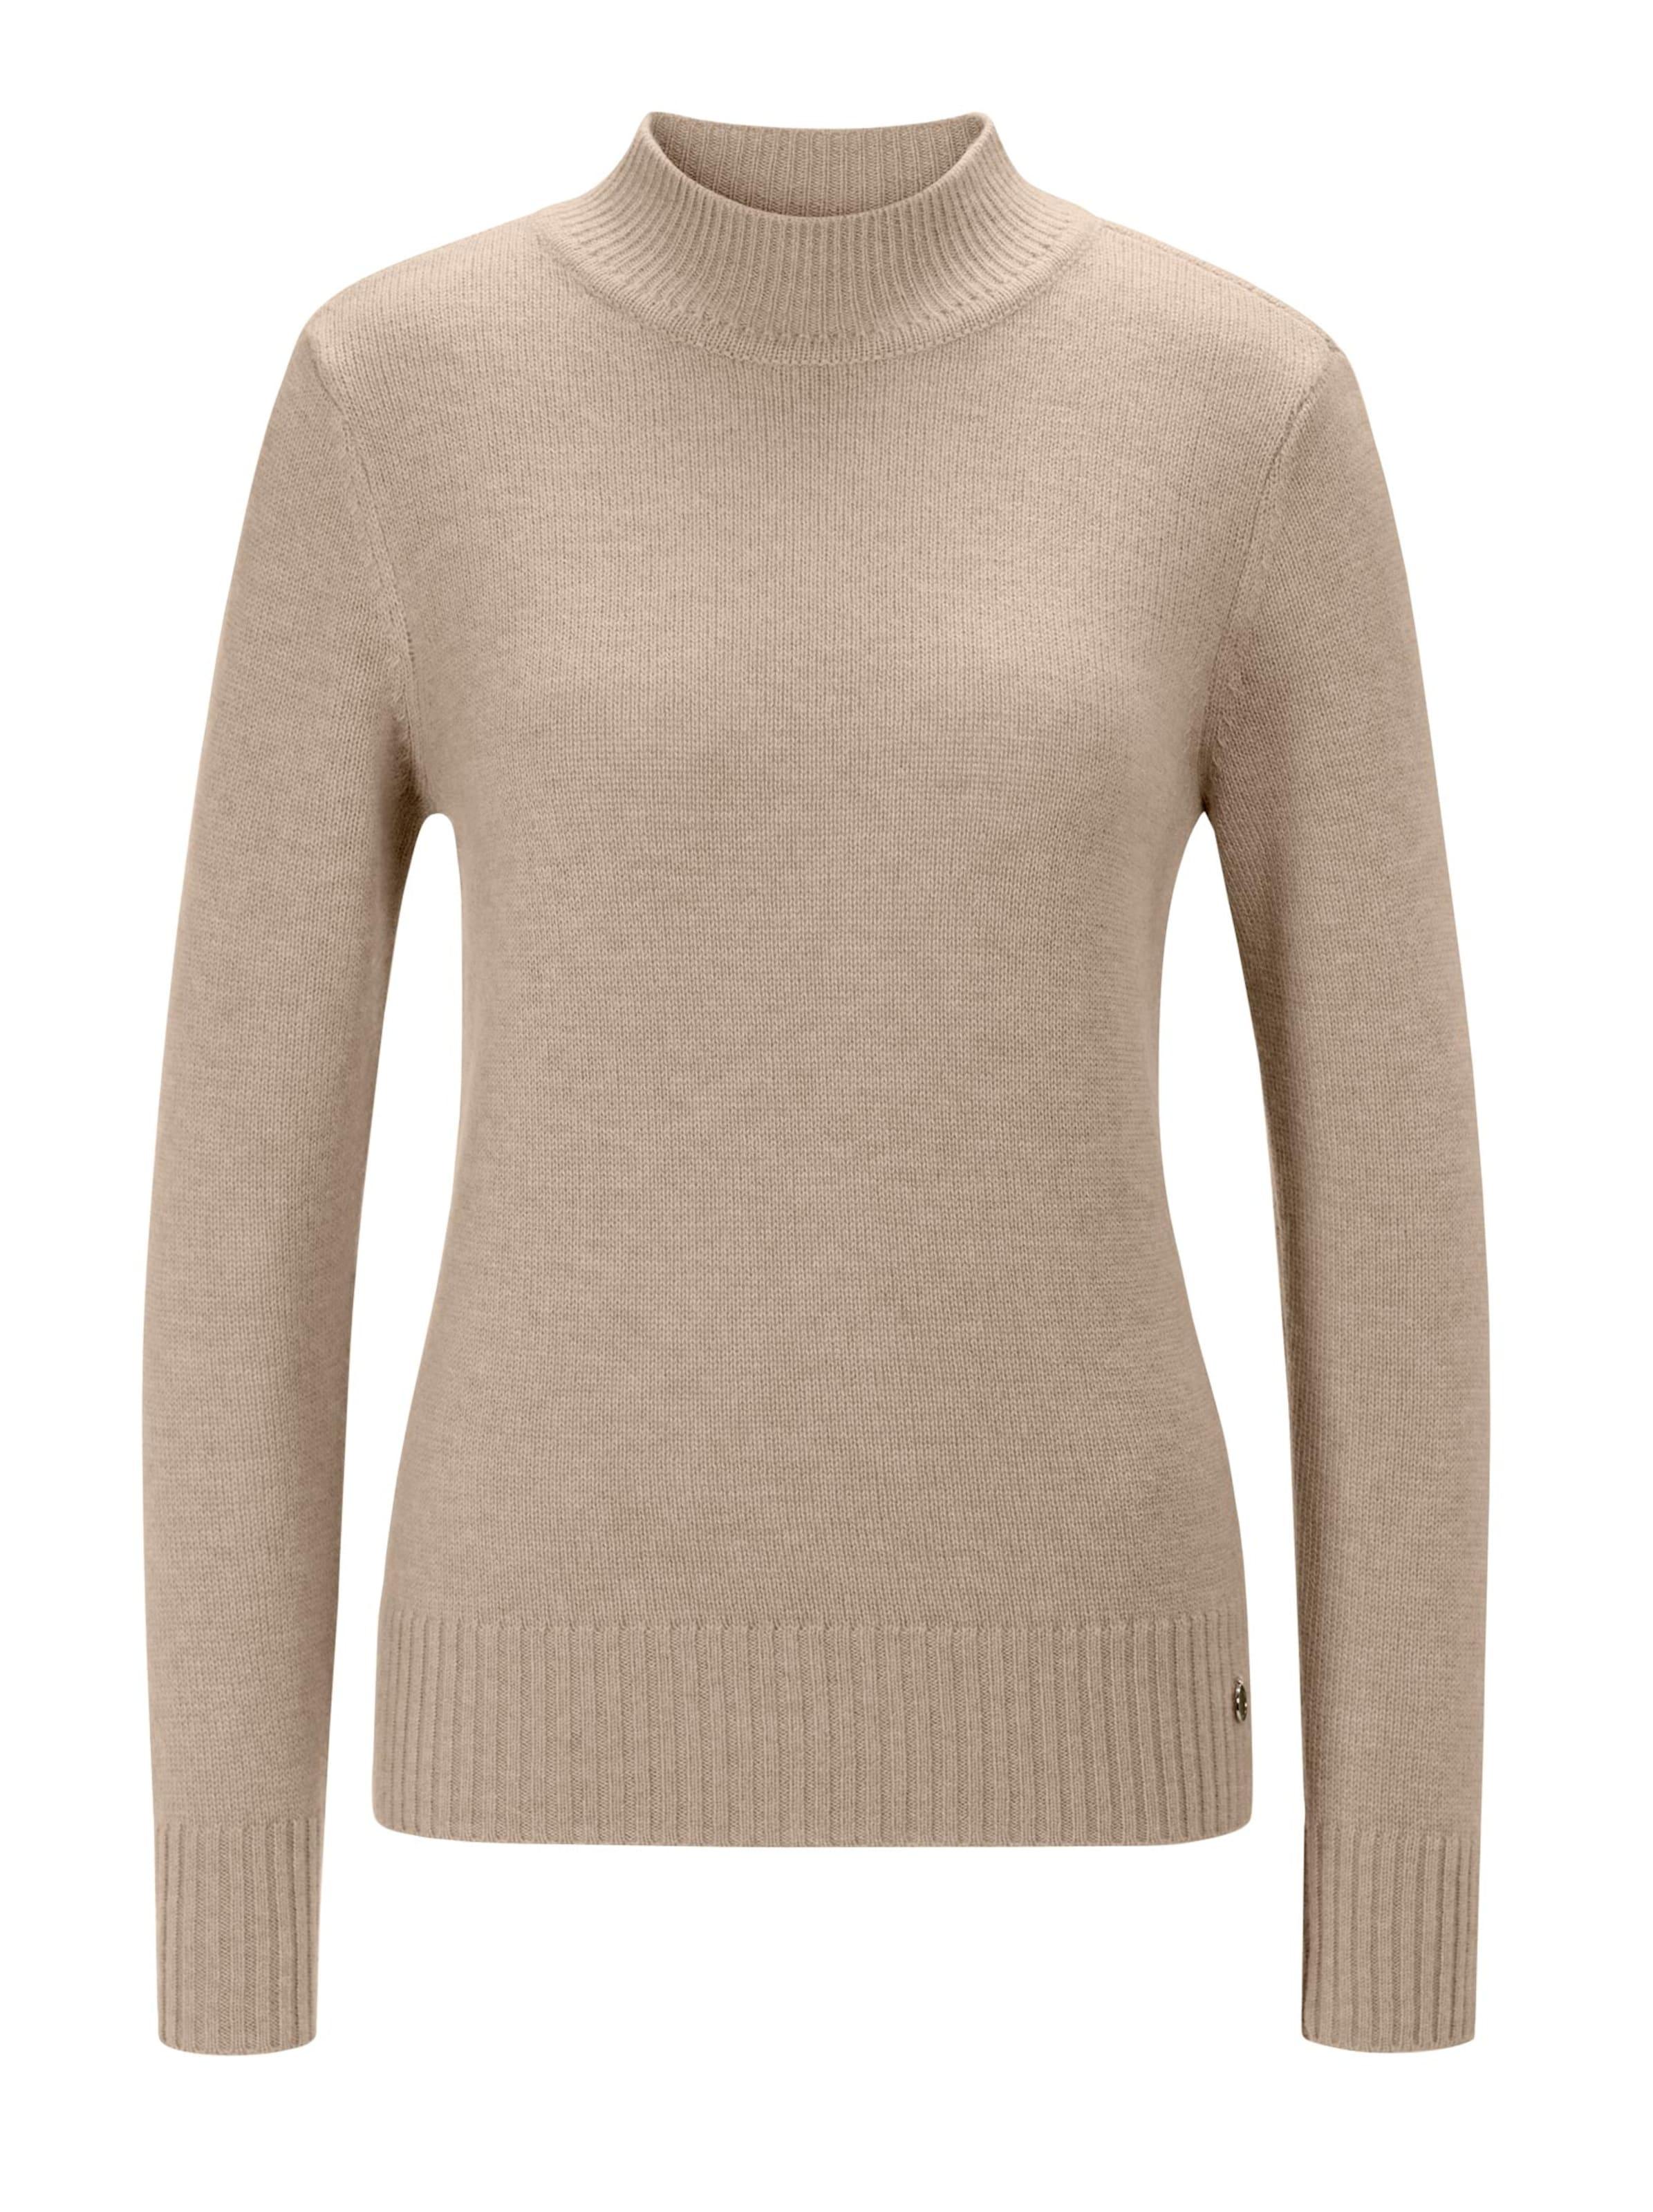 creation l premium - Witt Weiden Damen Merino-Kaschmir-Pullover beige-meliert